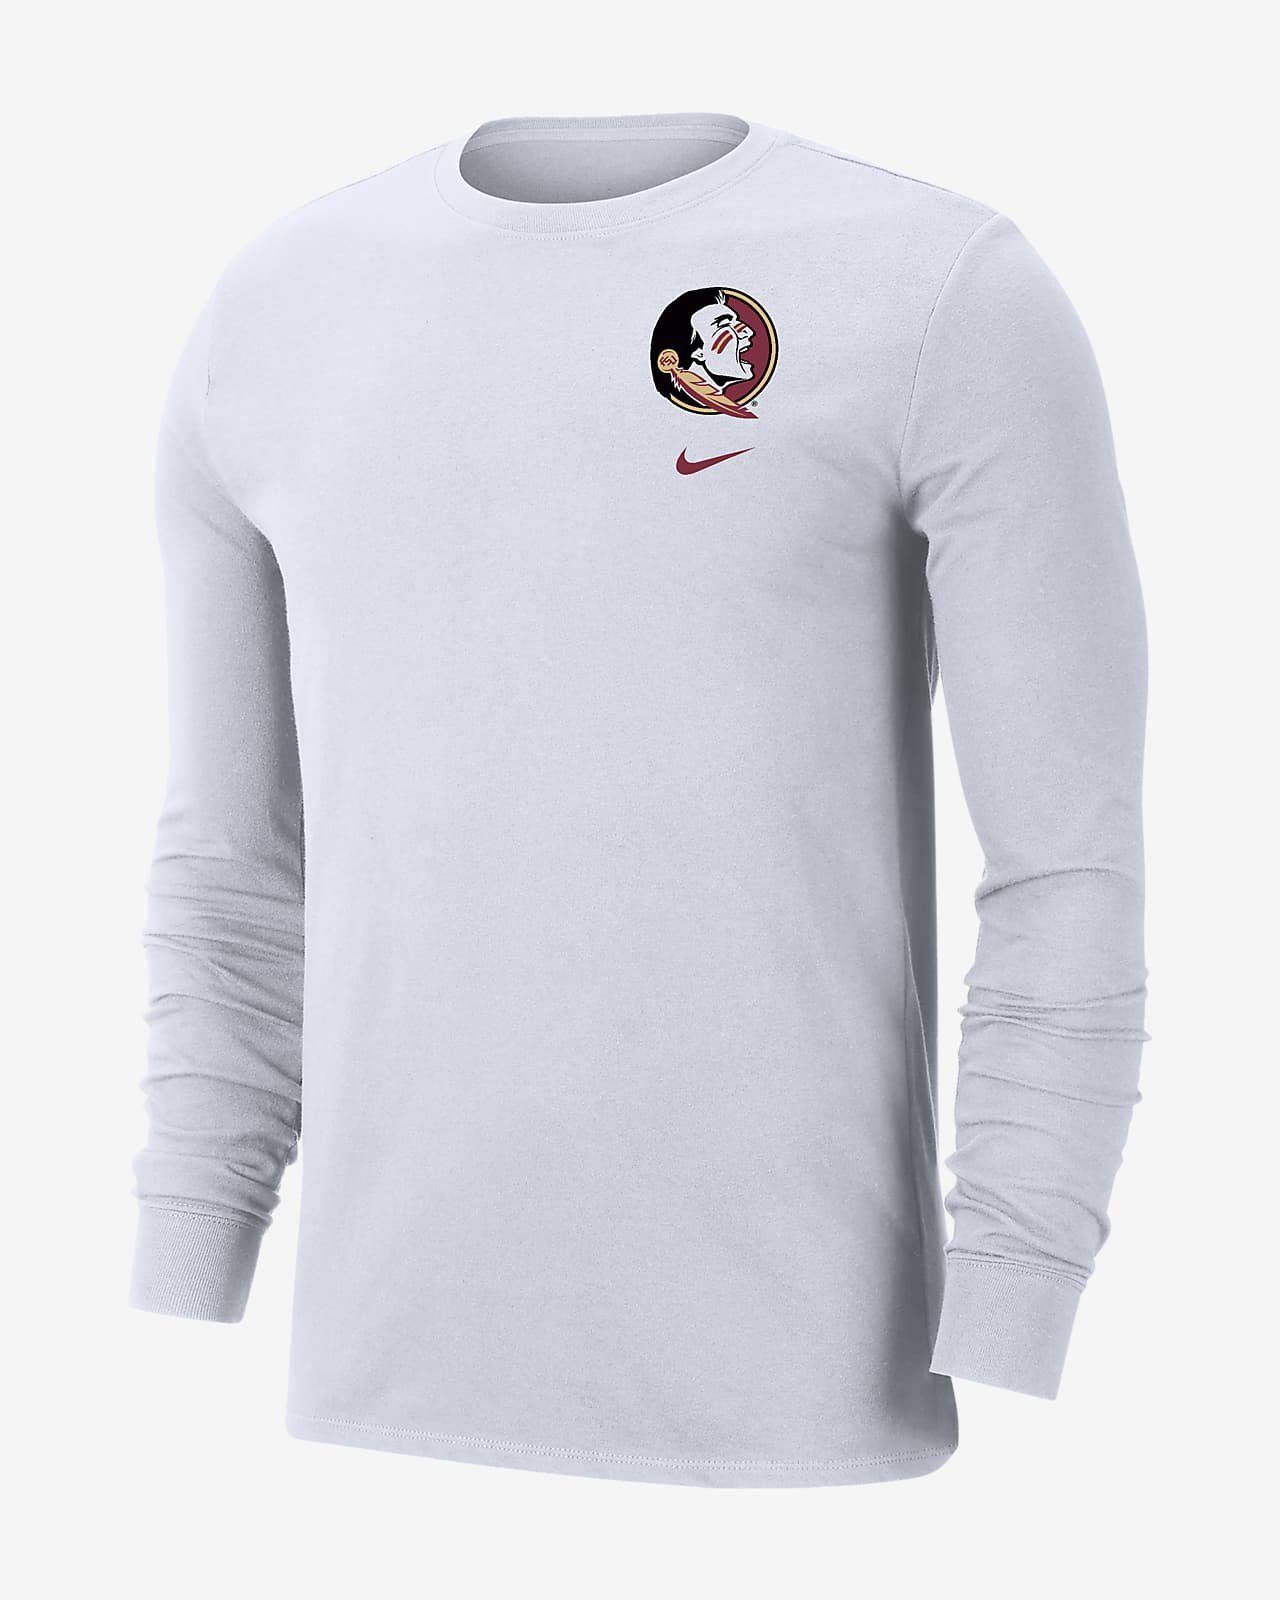 Nike College (Florida State) Men's Long-Sleeve T-Shirt